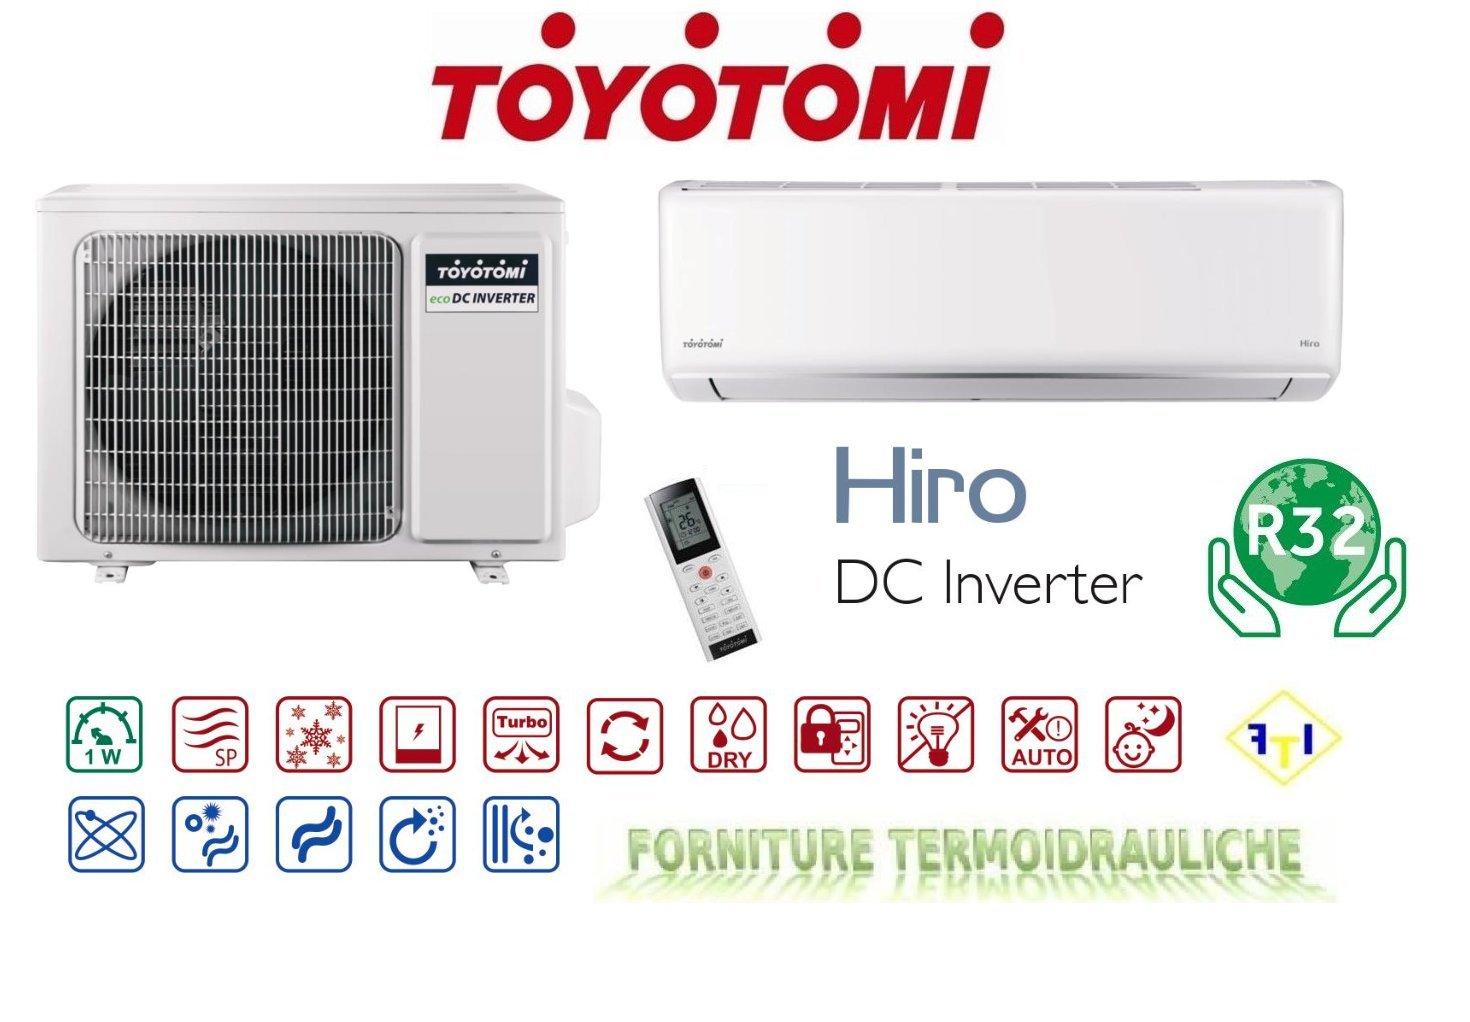 Climatiseur/Climatisation Inverter 9000btu Toyotomi série Hiro–htn-htg 09iv